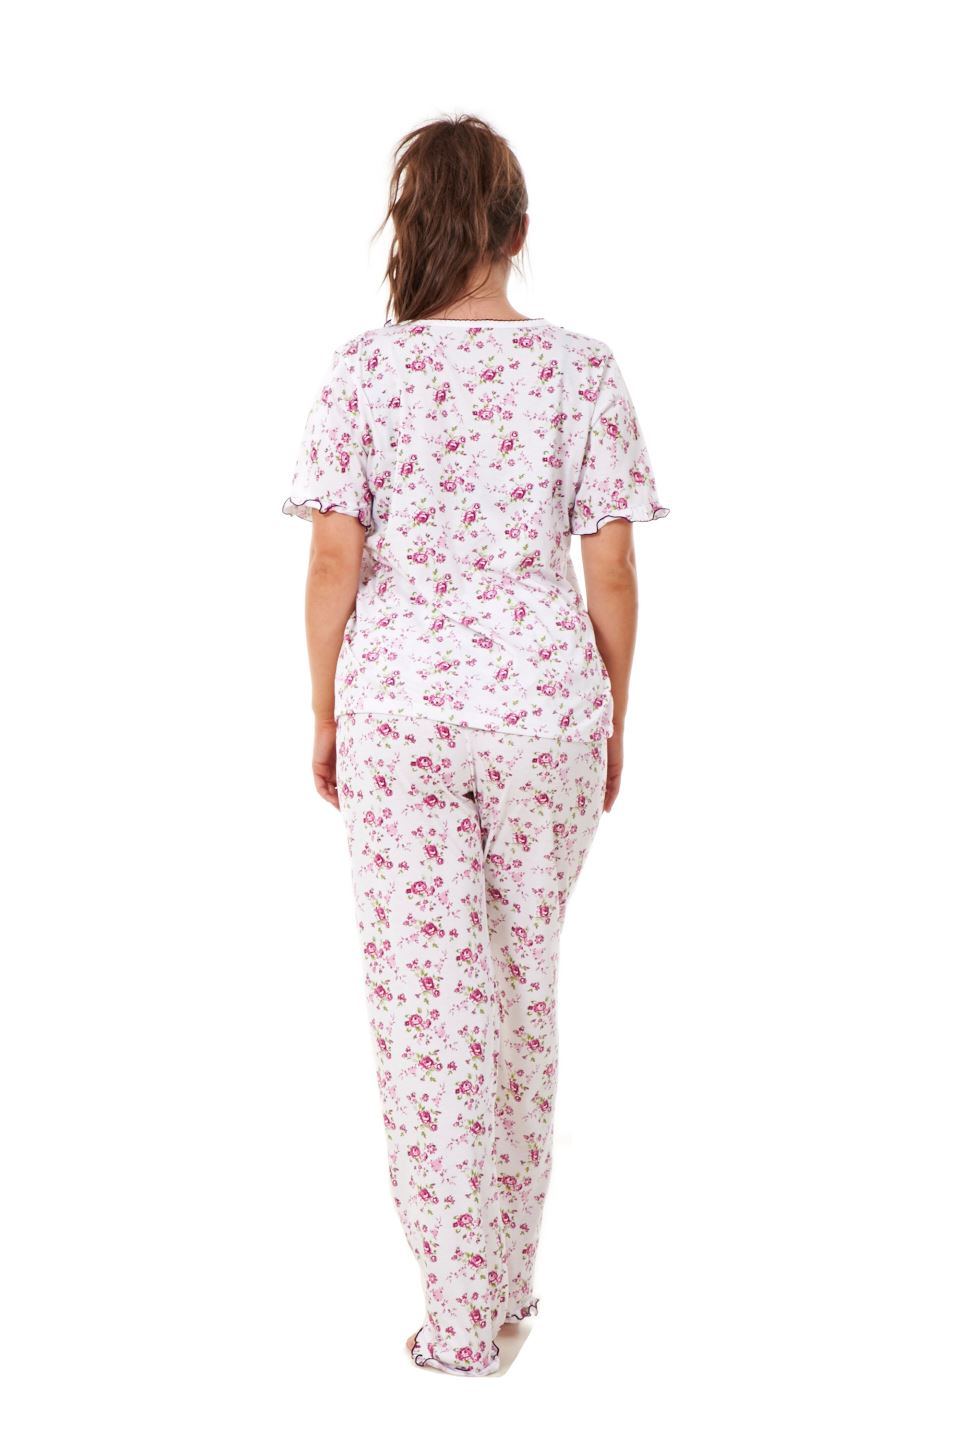 Ladies Women Pyjama Sets Floral Cotton Short Sleeve Button Nightwear Soft PJ's